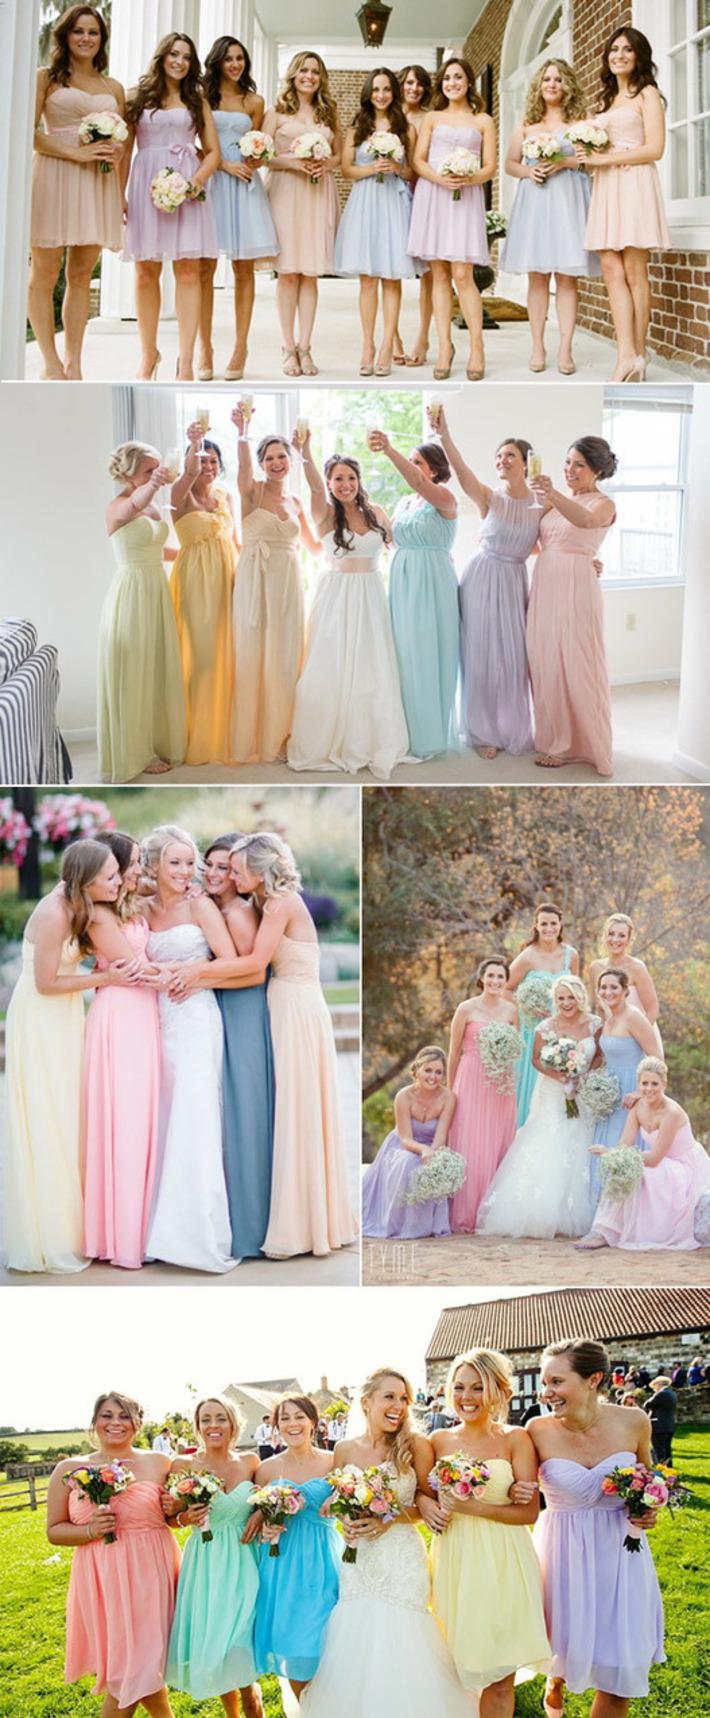 Top 7 Wedding Ideas & Trends for Spring/Summer 2015 | Wedding Ideas | Scoop.it